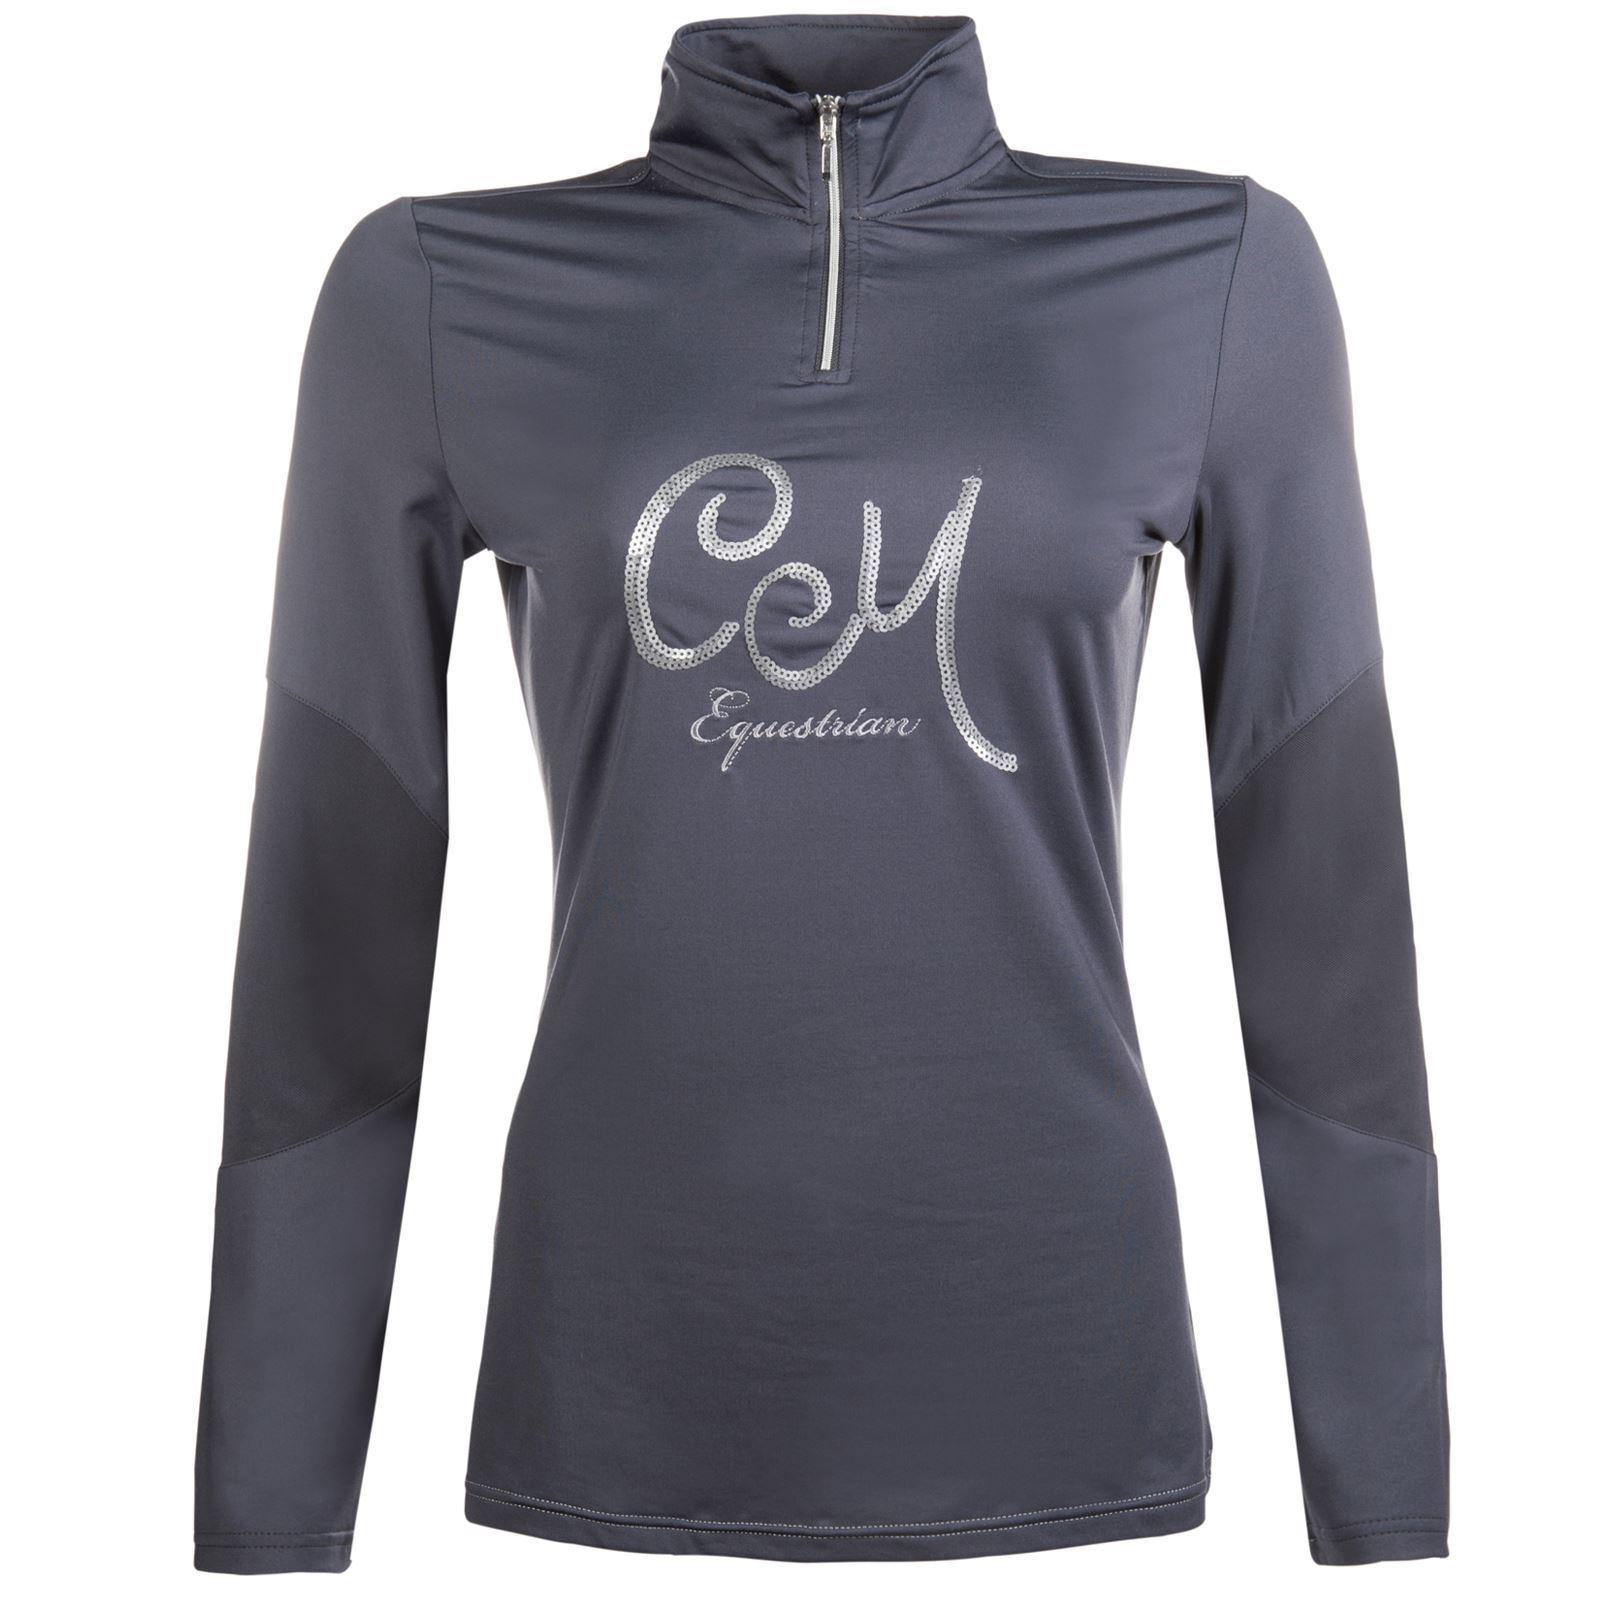 Cavallino Marino Piemont Sequin Tailored Long Sleeves Horse Riding Fashion Shirt